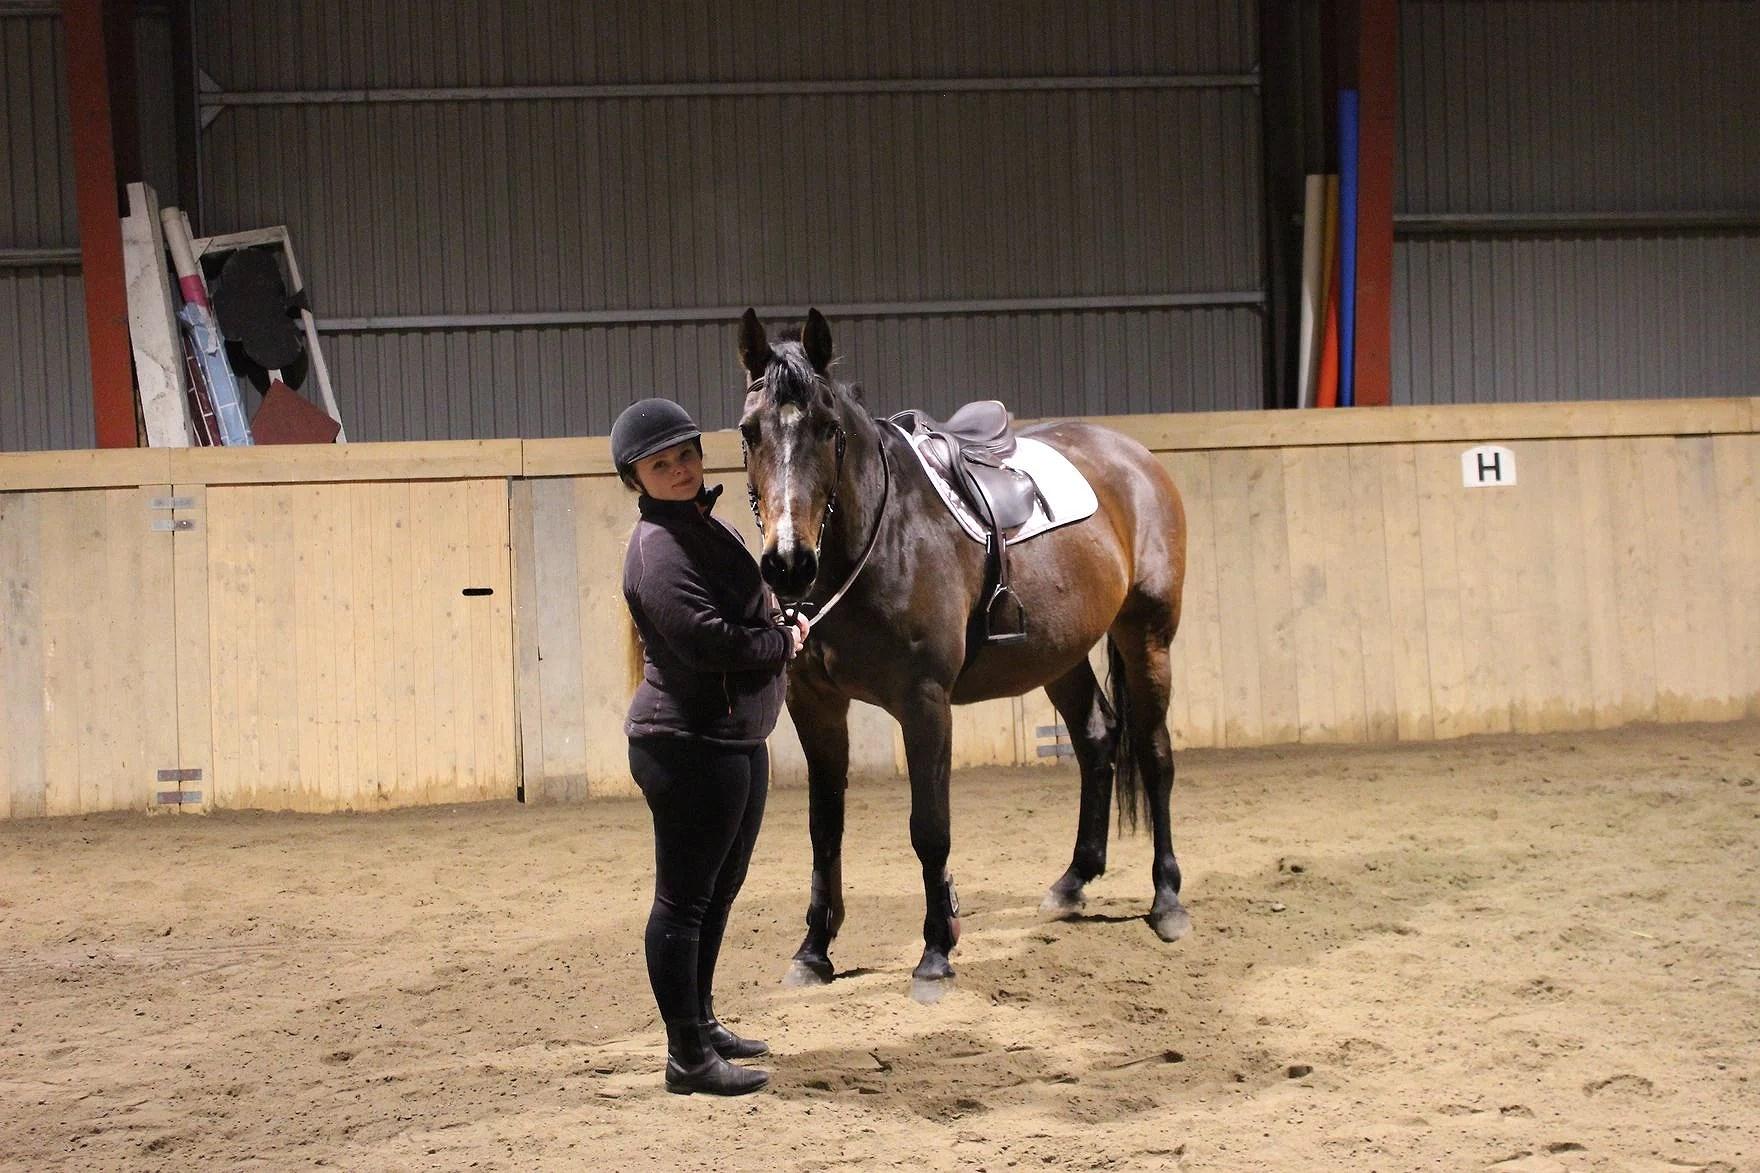 Hur skulle livet se ut utan häst?